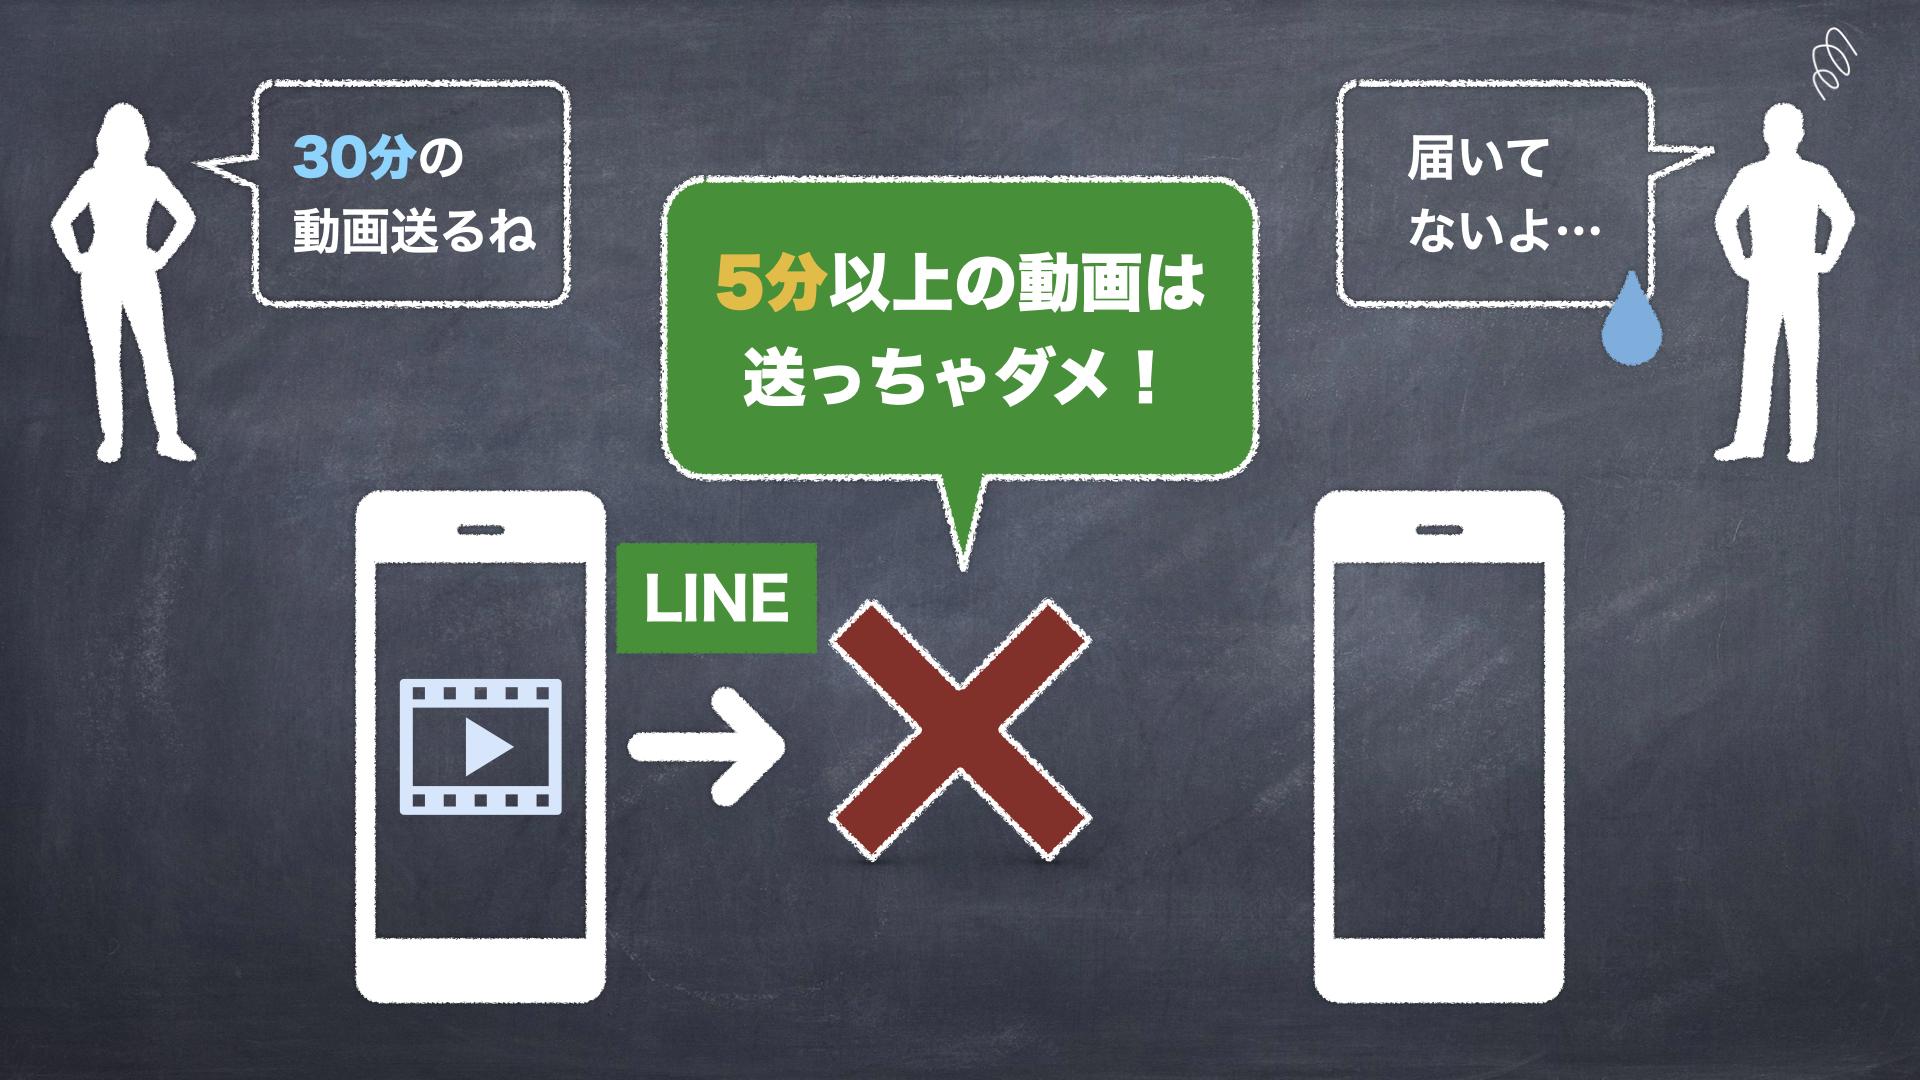 Line 五 分 以上 の 動画 送る 方法